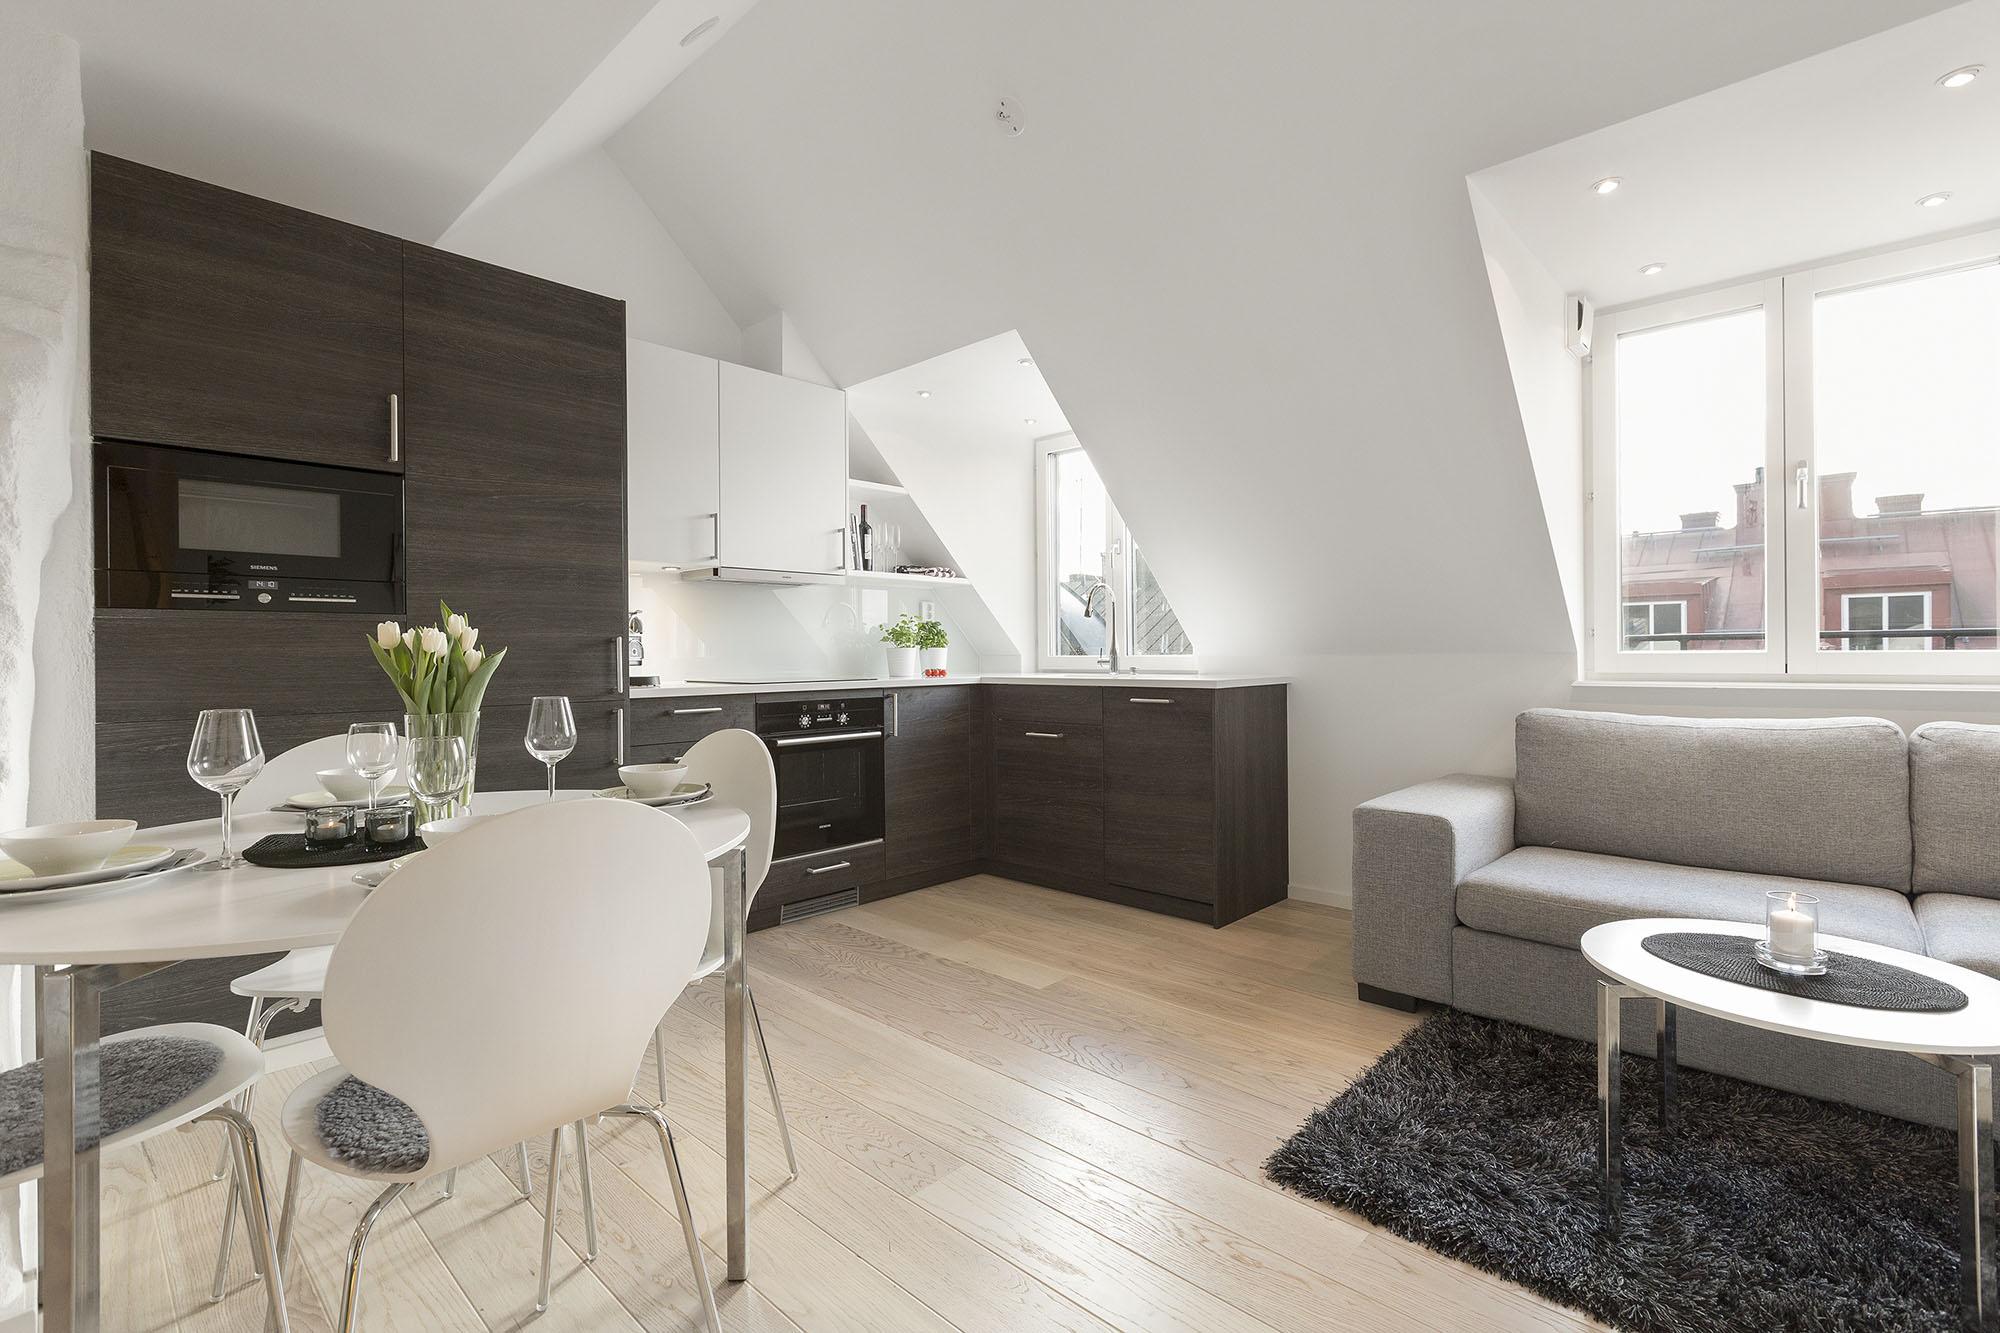 Unique Stockholm Attic Loft Apartment With Stylish Modern